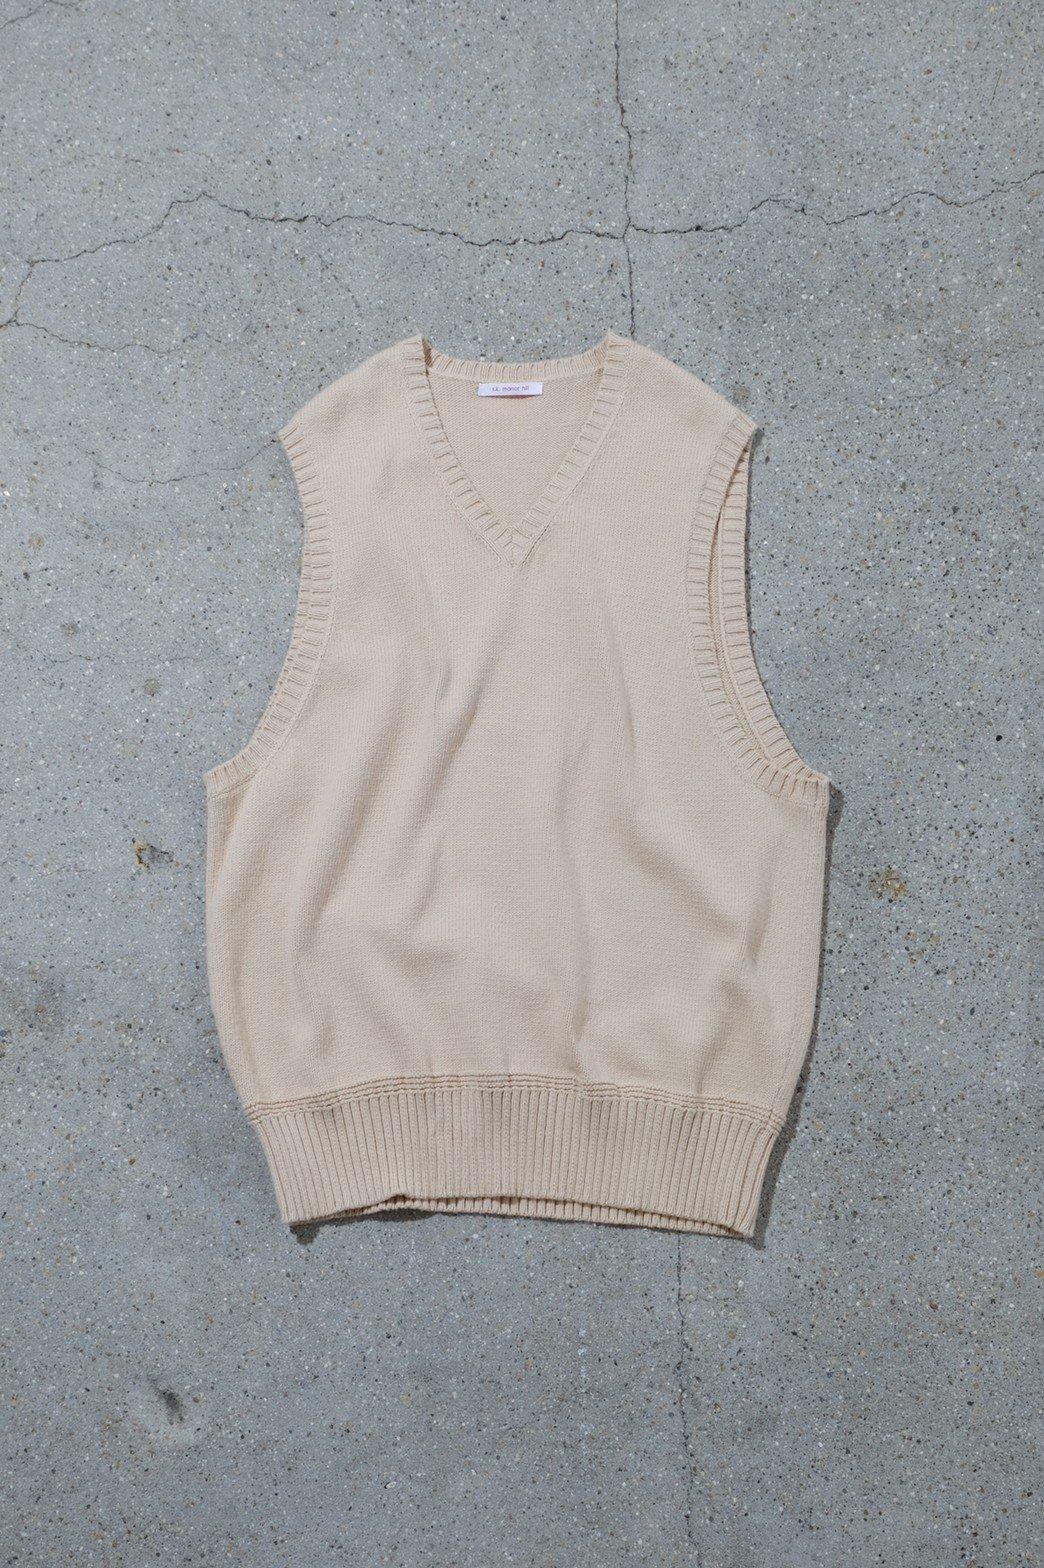 s.k. manor hill / Sweater Vest